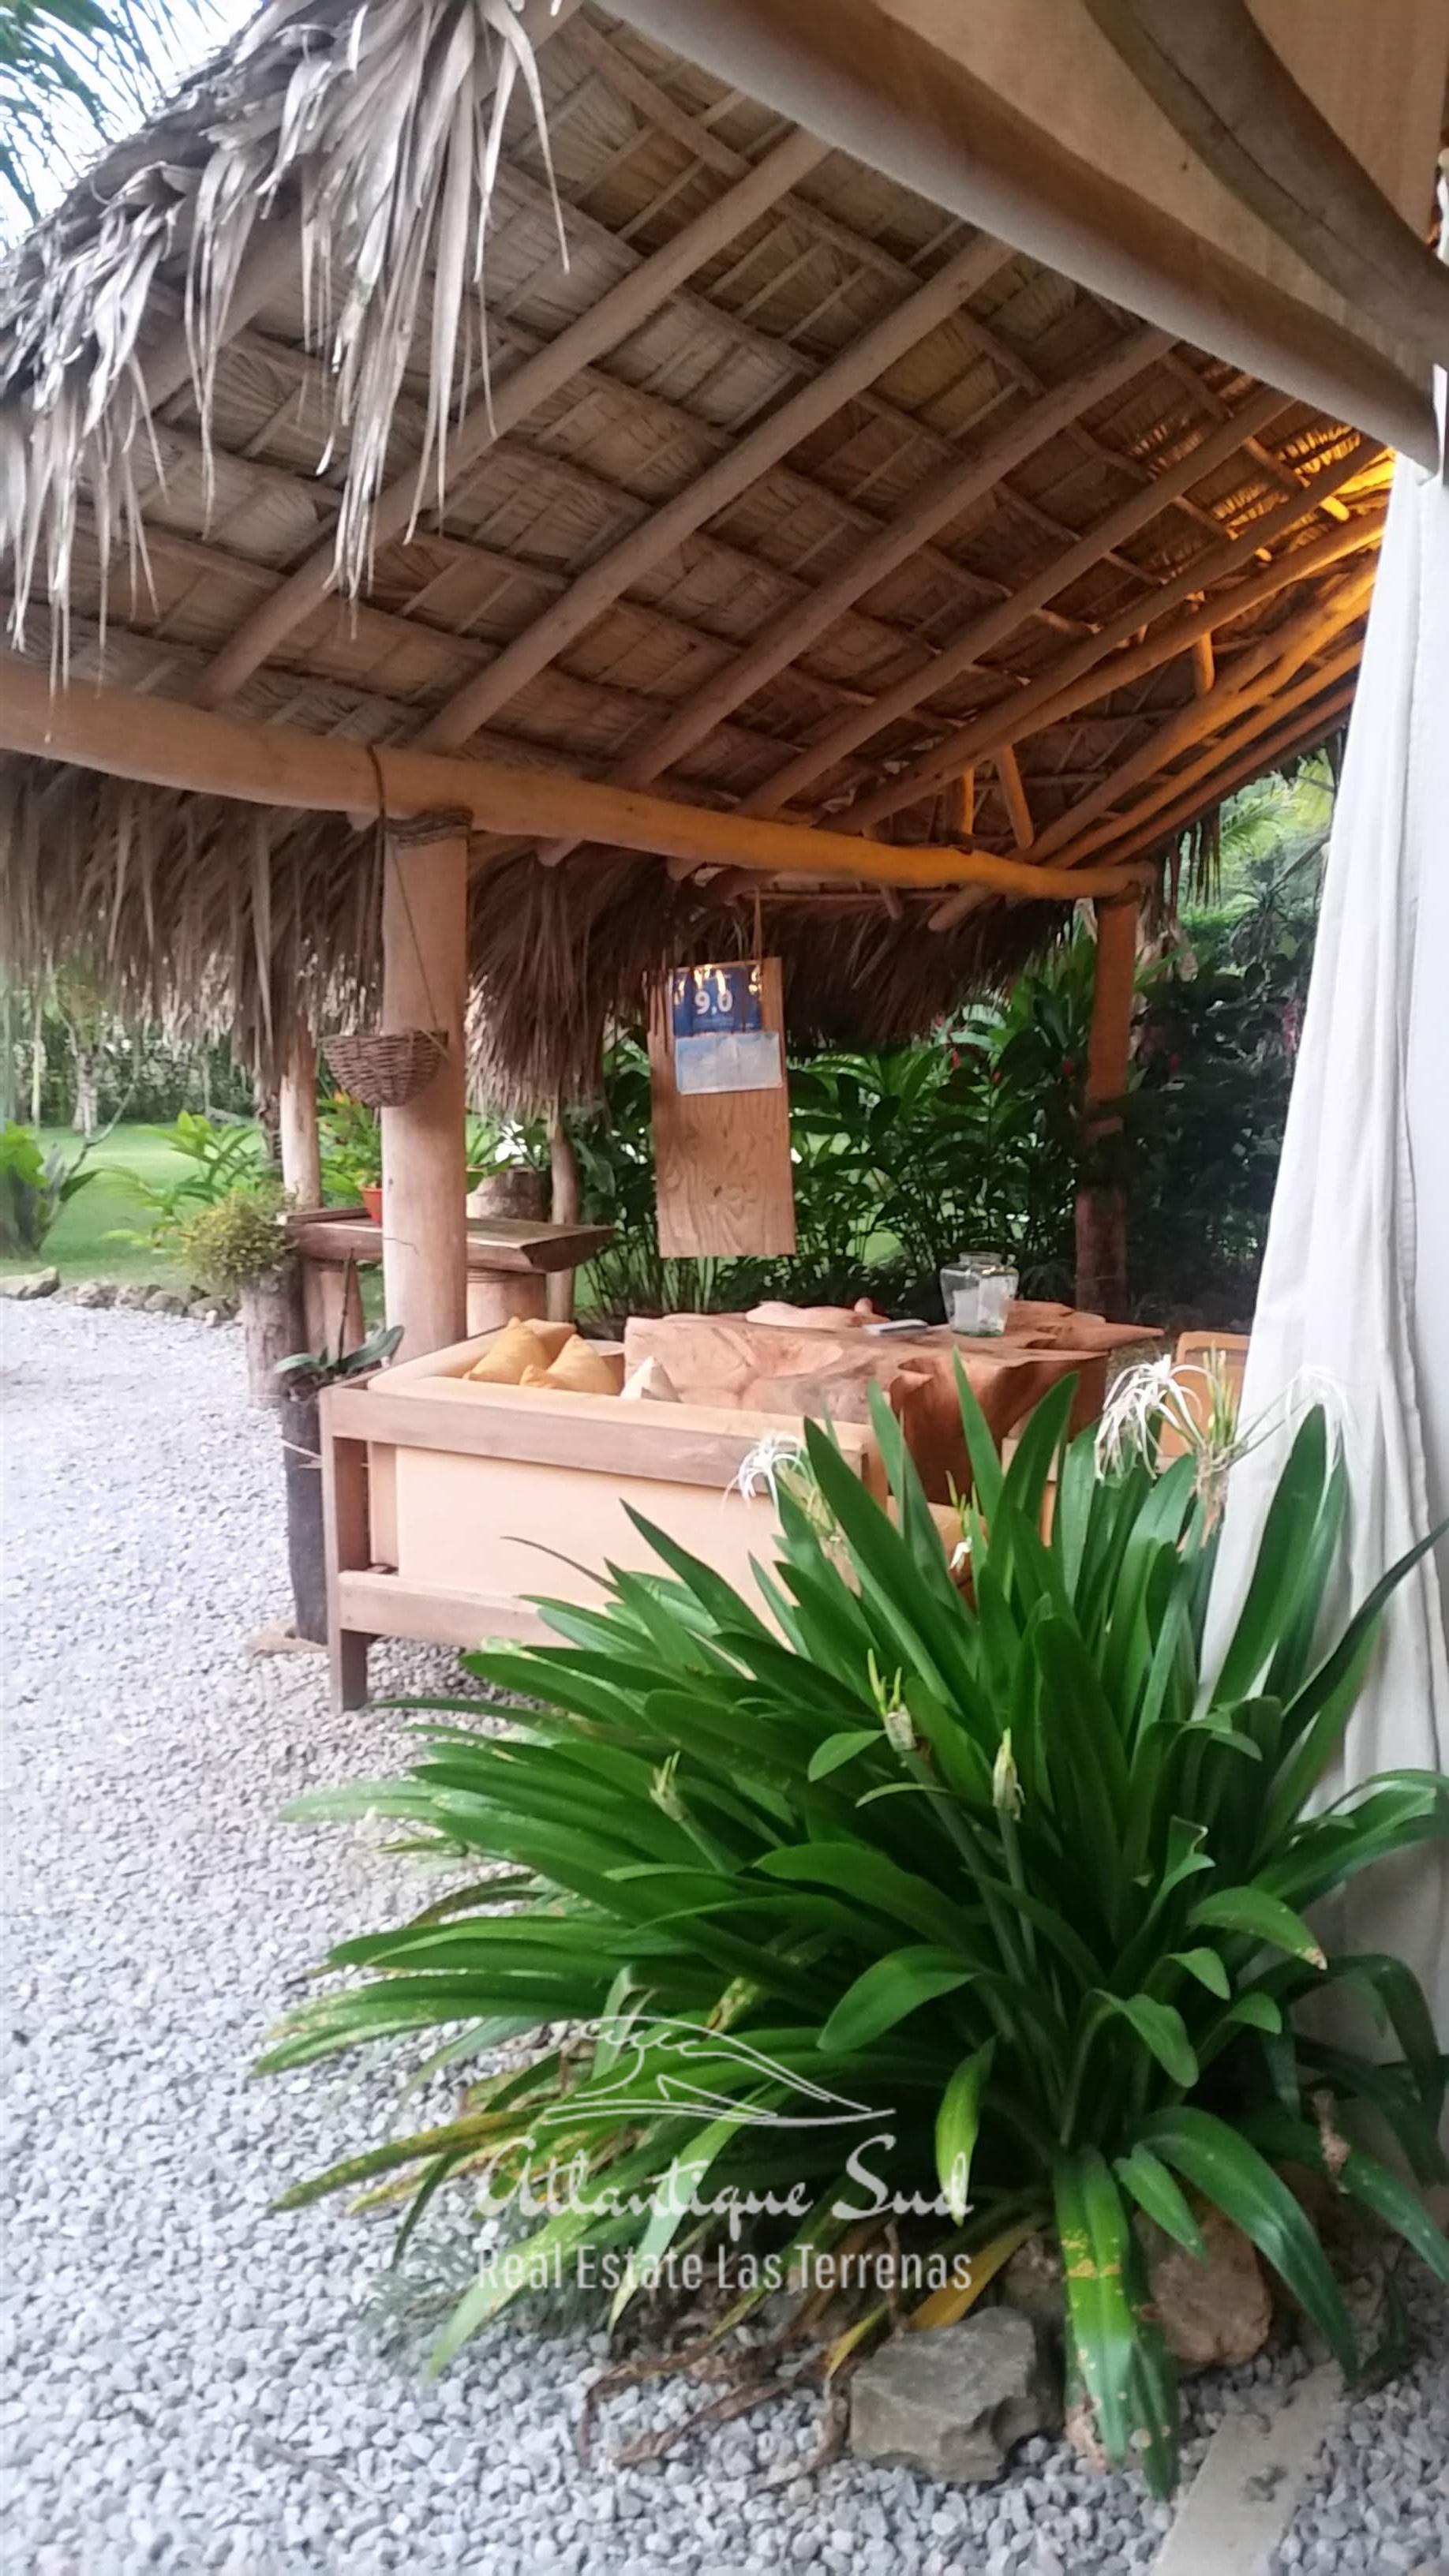 Typical caribbean hotel for sale Real Estate Las Terrenas Dominican Republic Atlantique Sud14.jpg